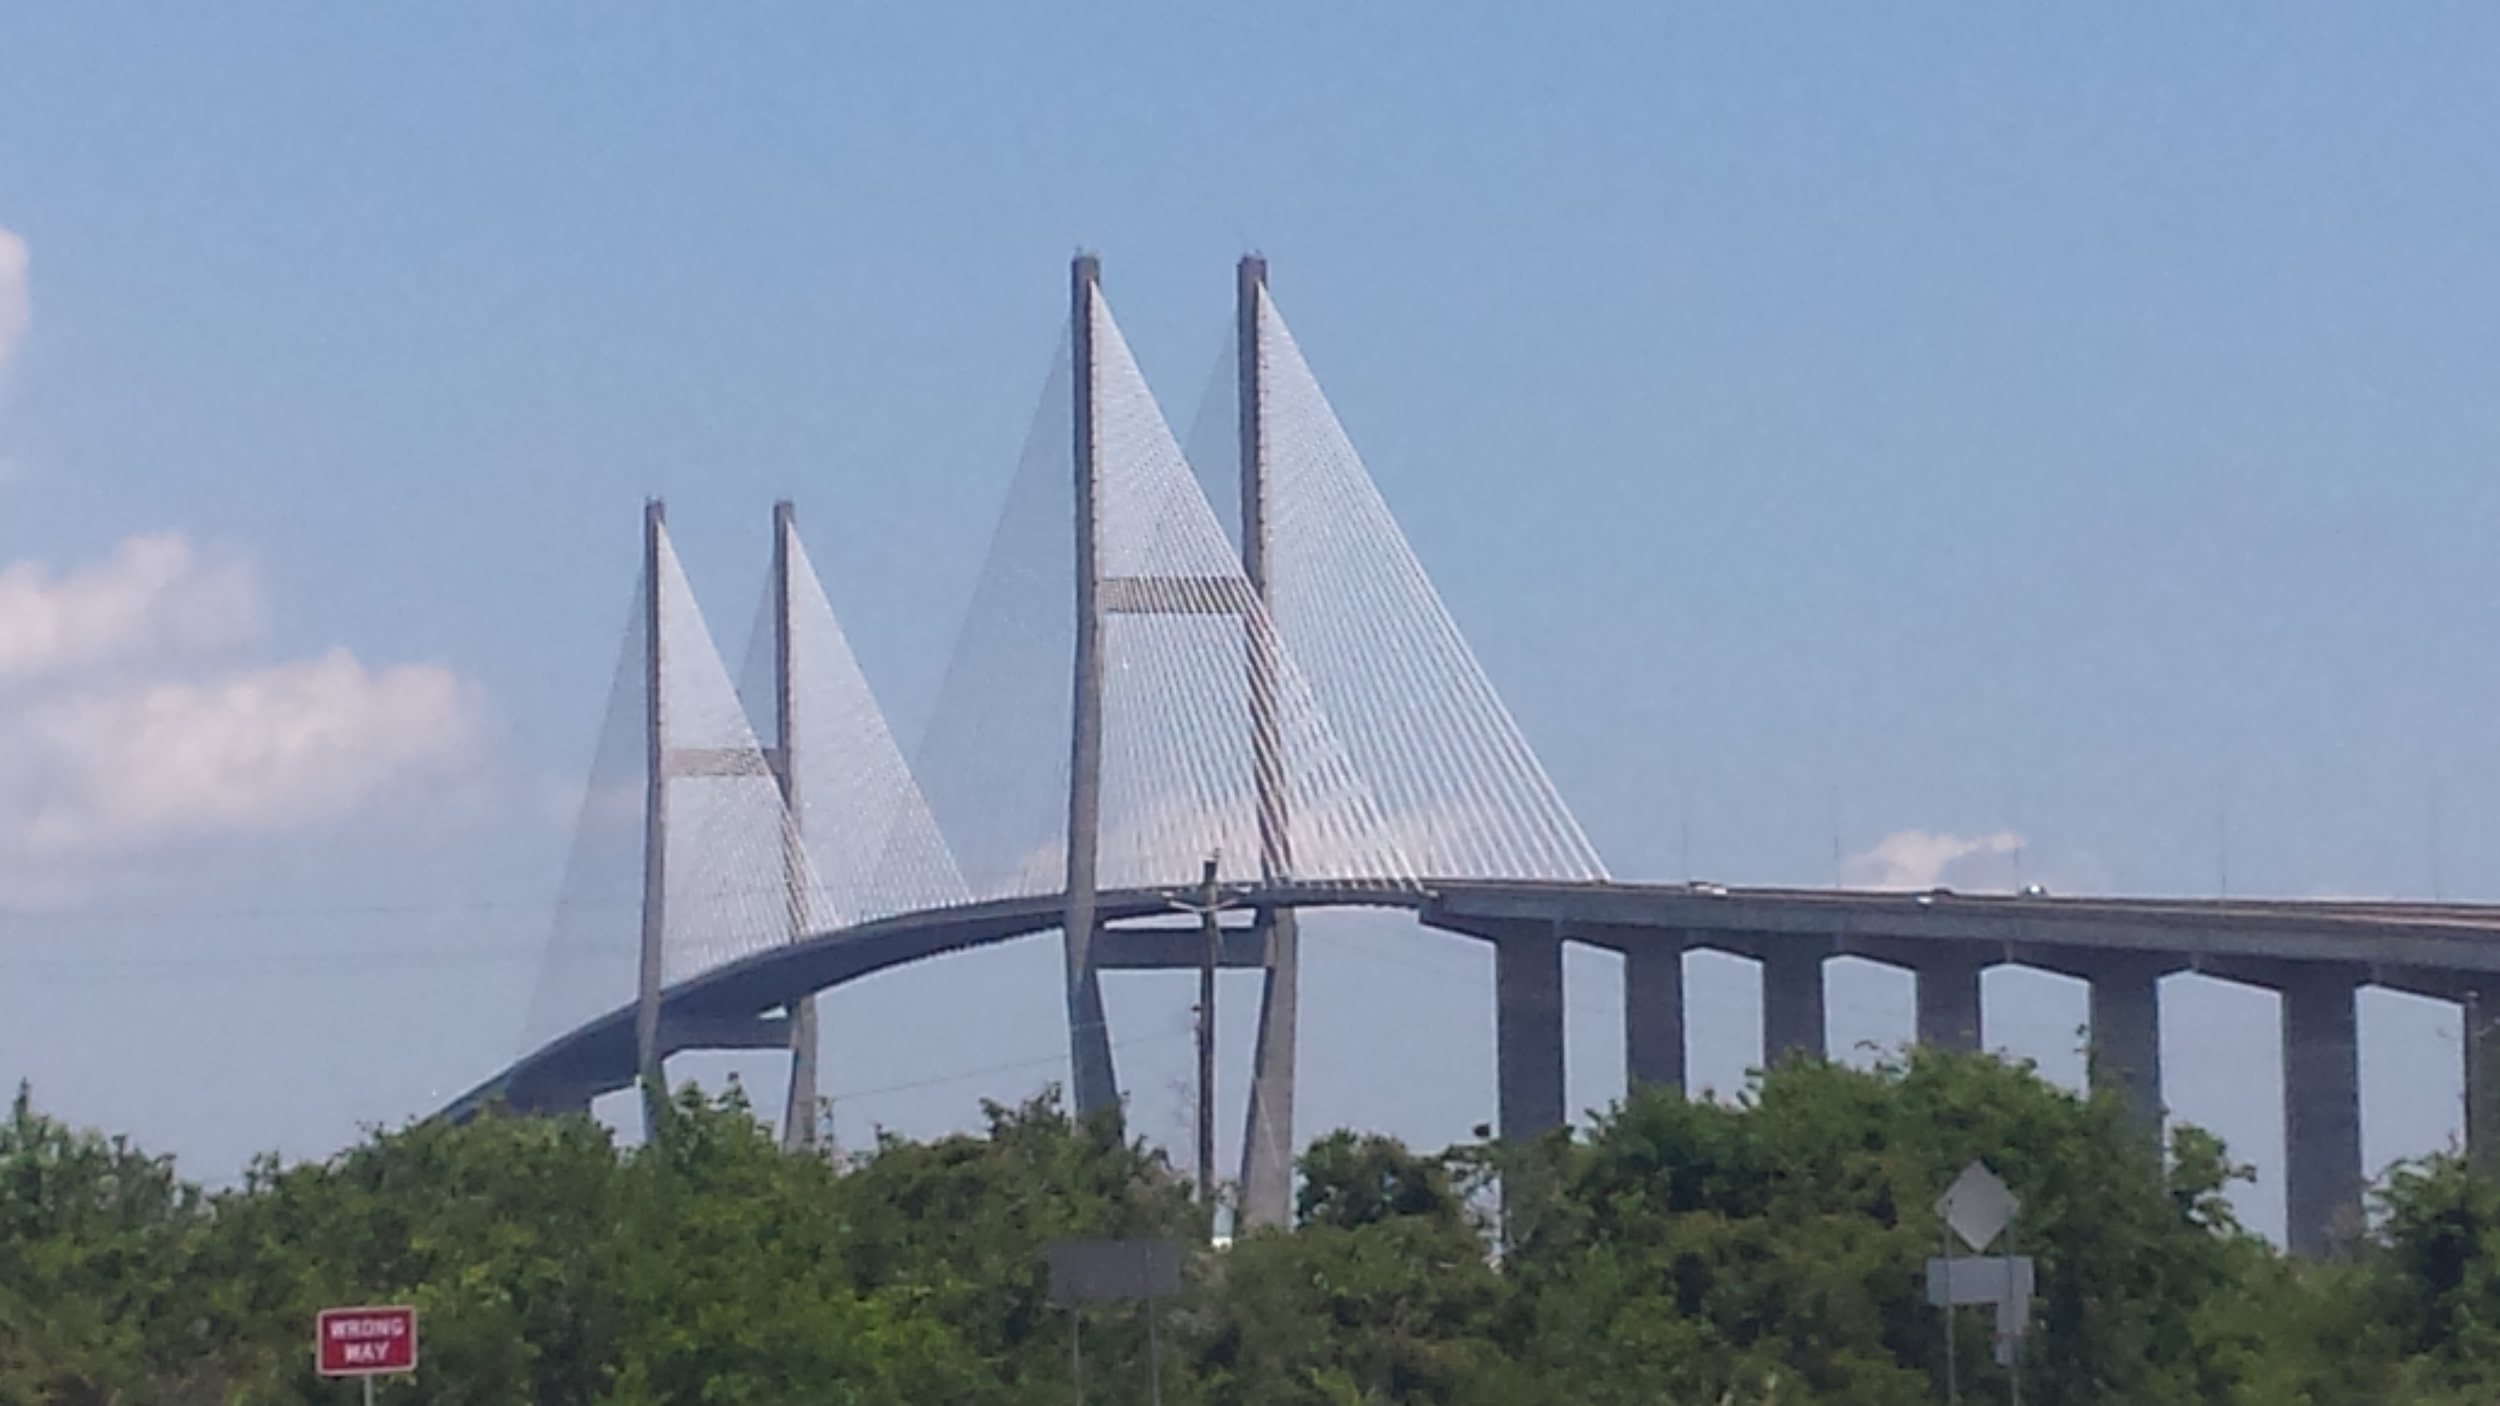 The Sidney Lanier bridge to Brunswick from Jekyll Island